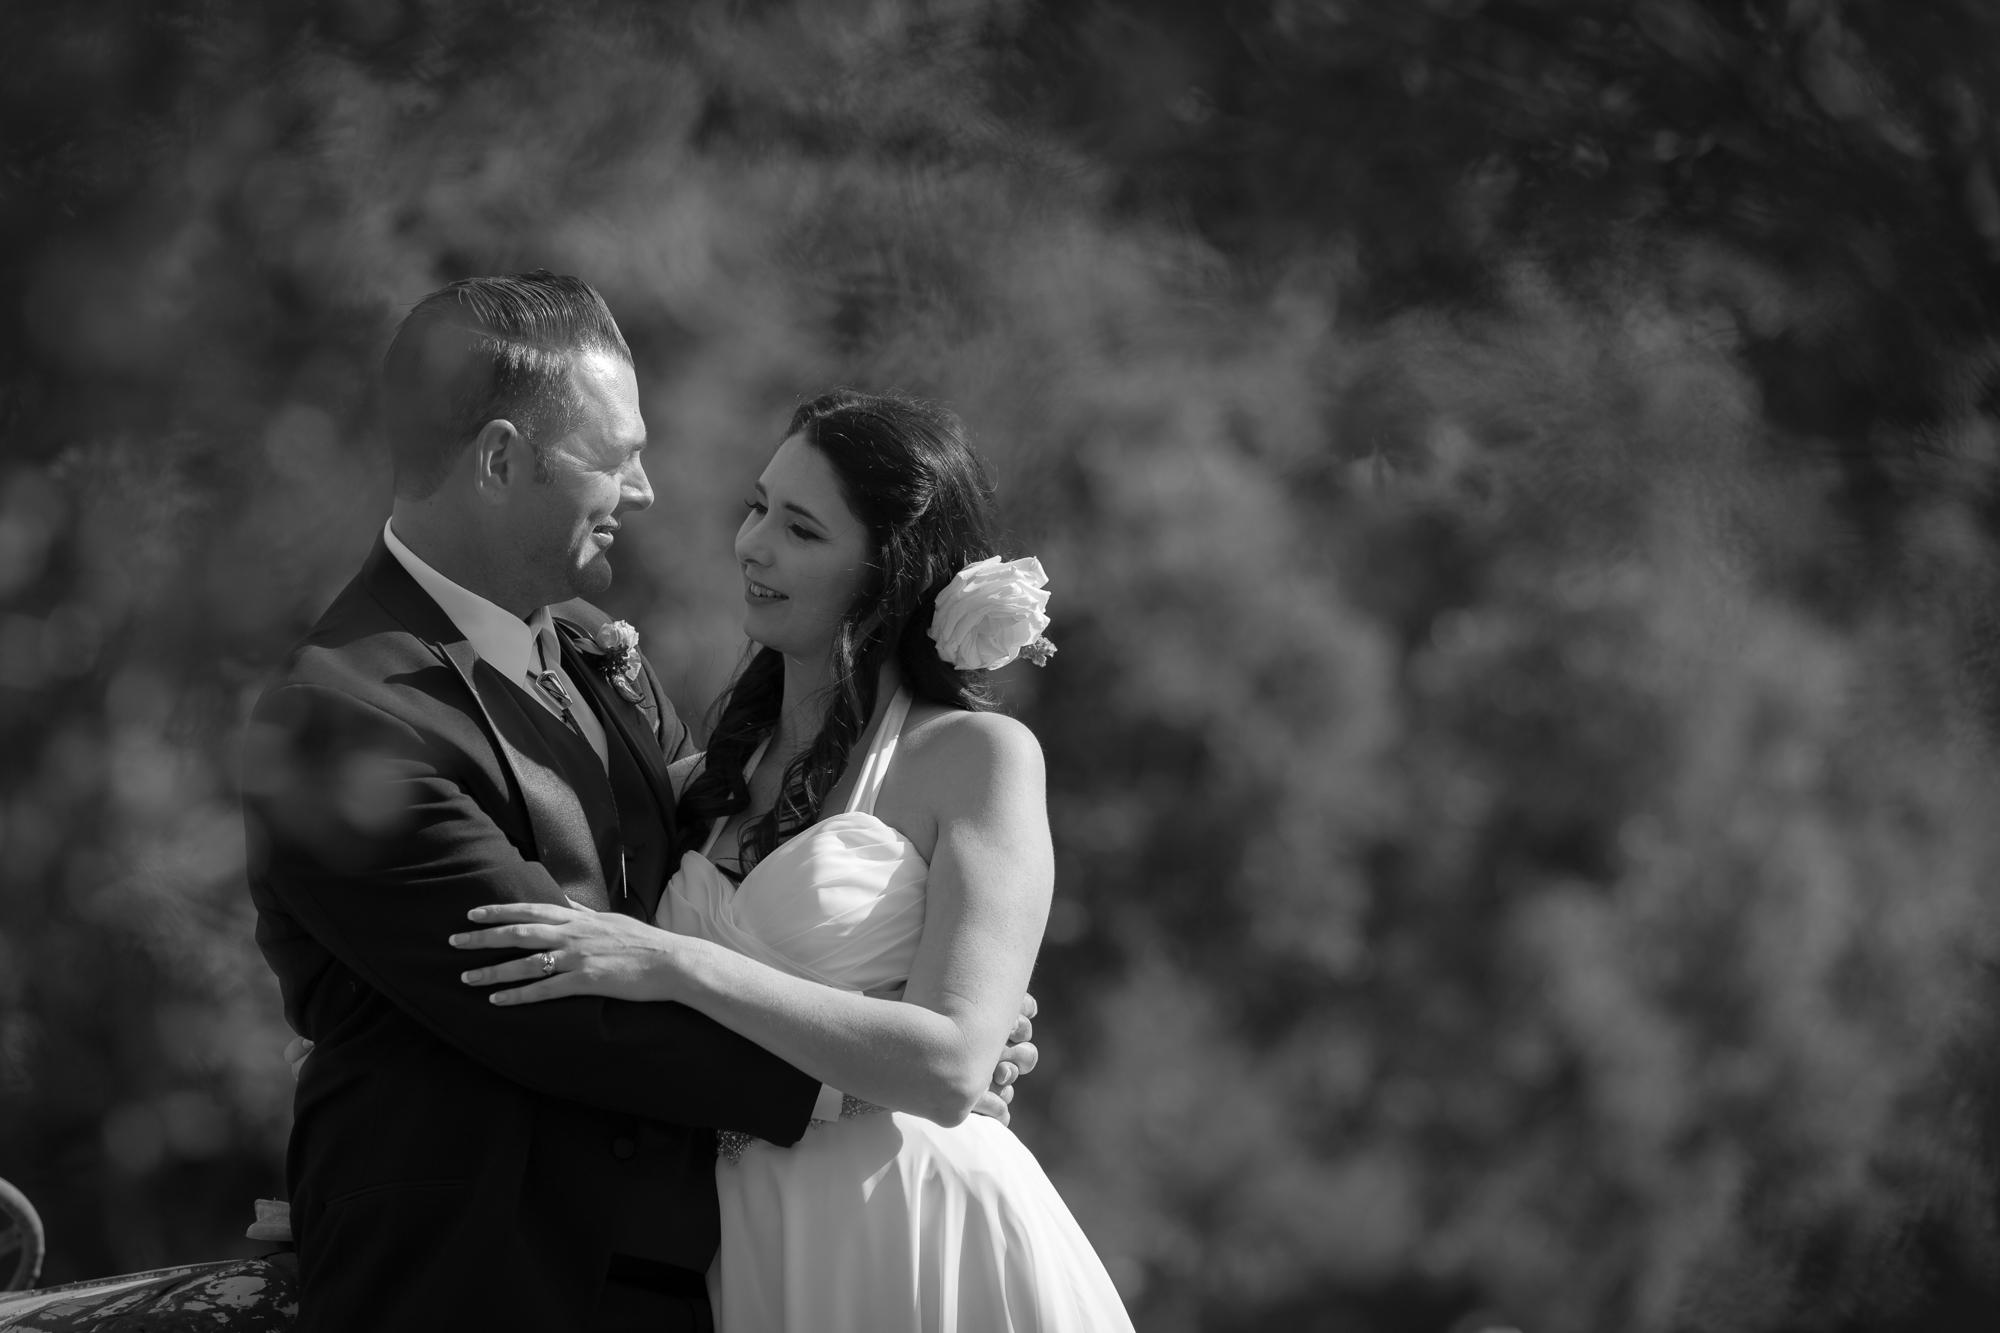 Gary-Kasl-SandKasl-Imaging-Wedding-Photography-40.jpg